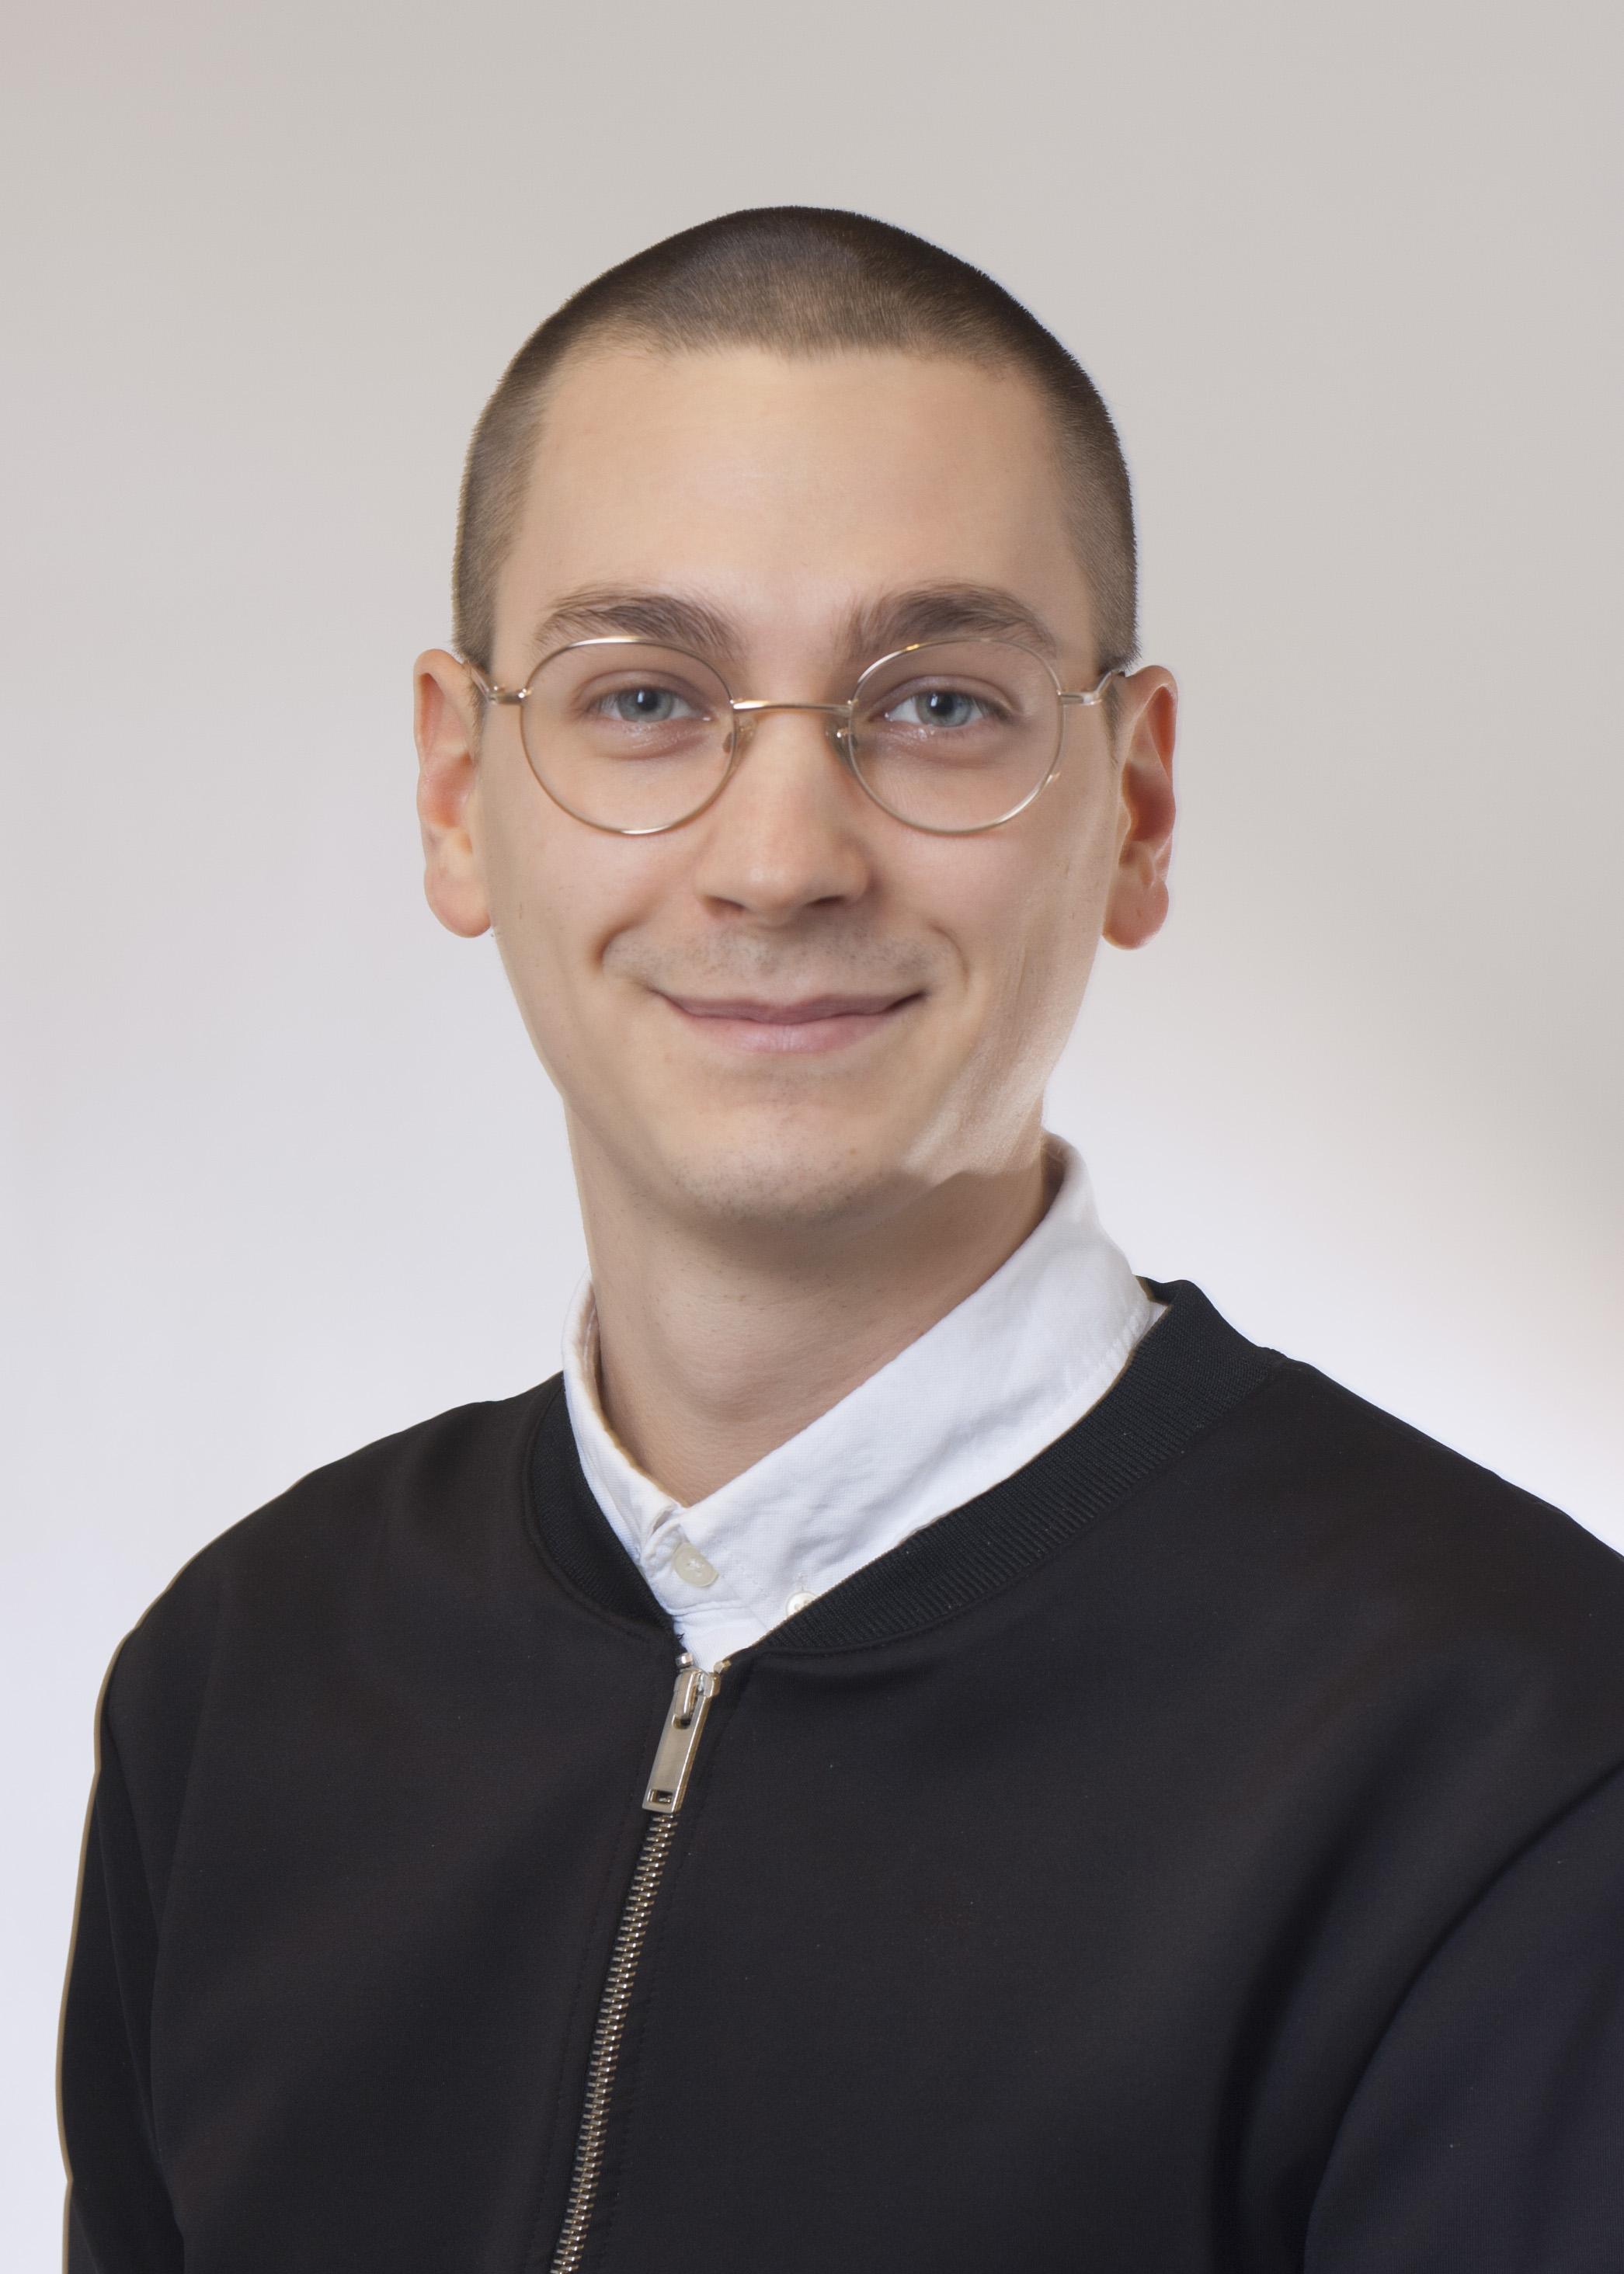 Jan Stanislaw Nowak